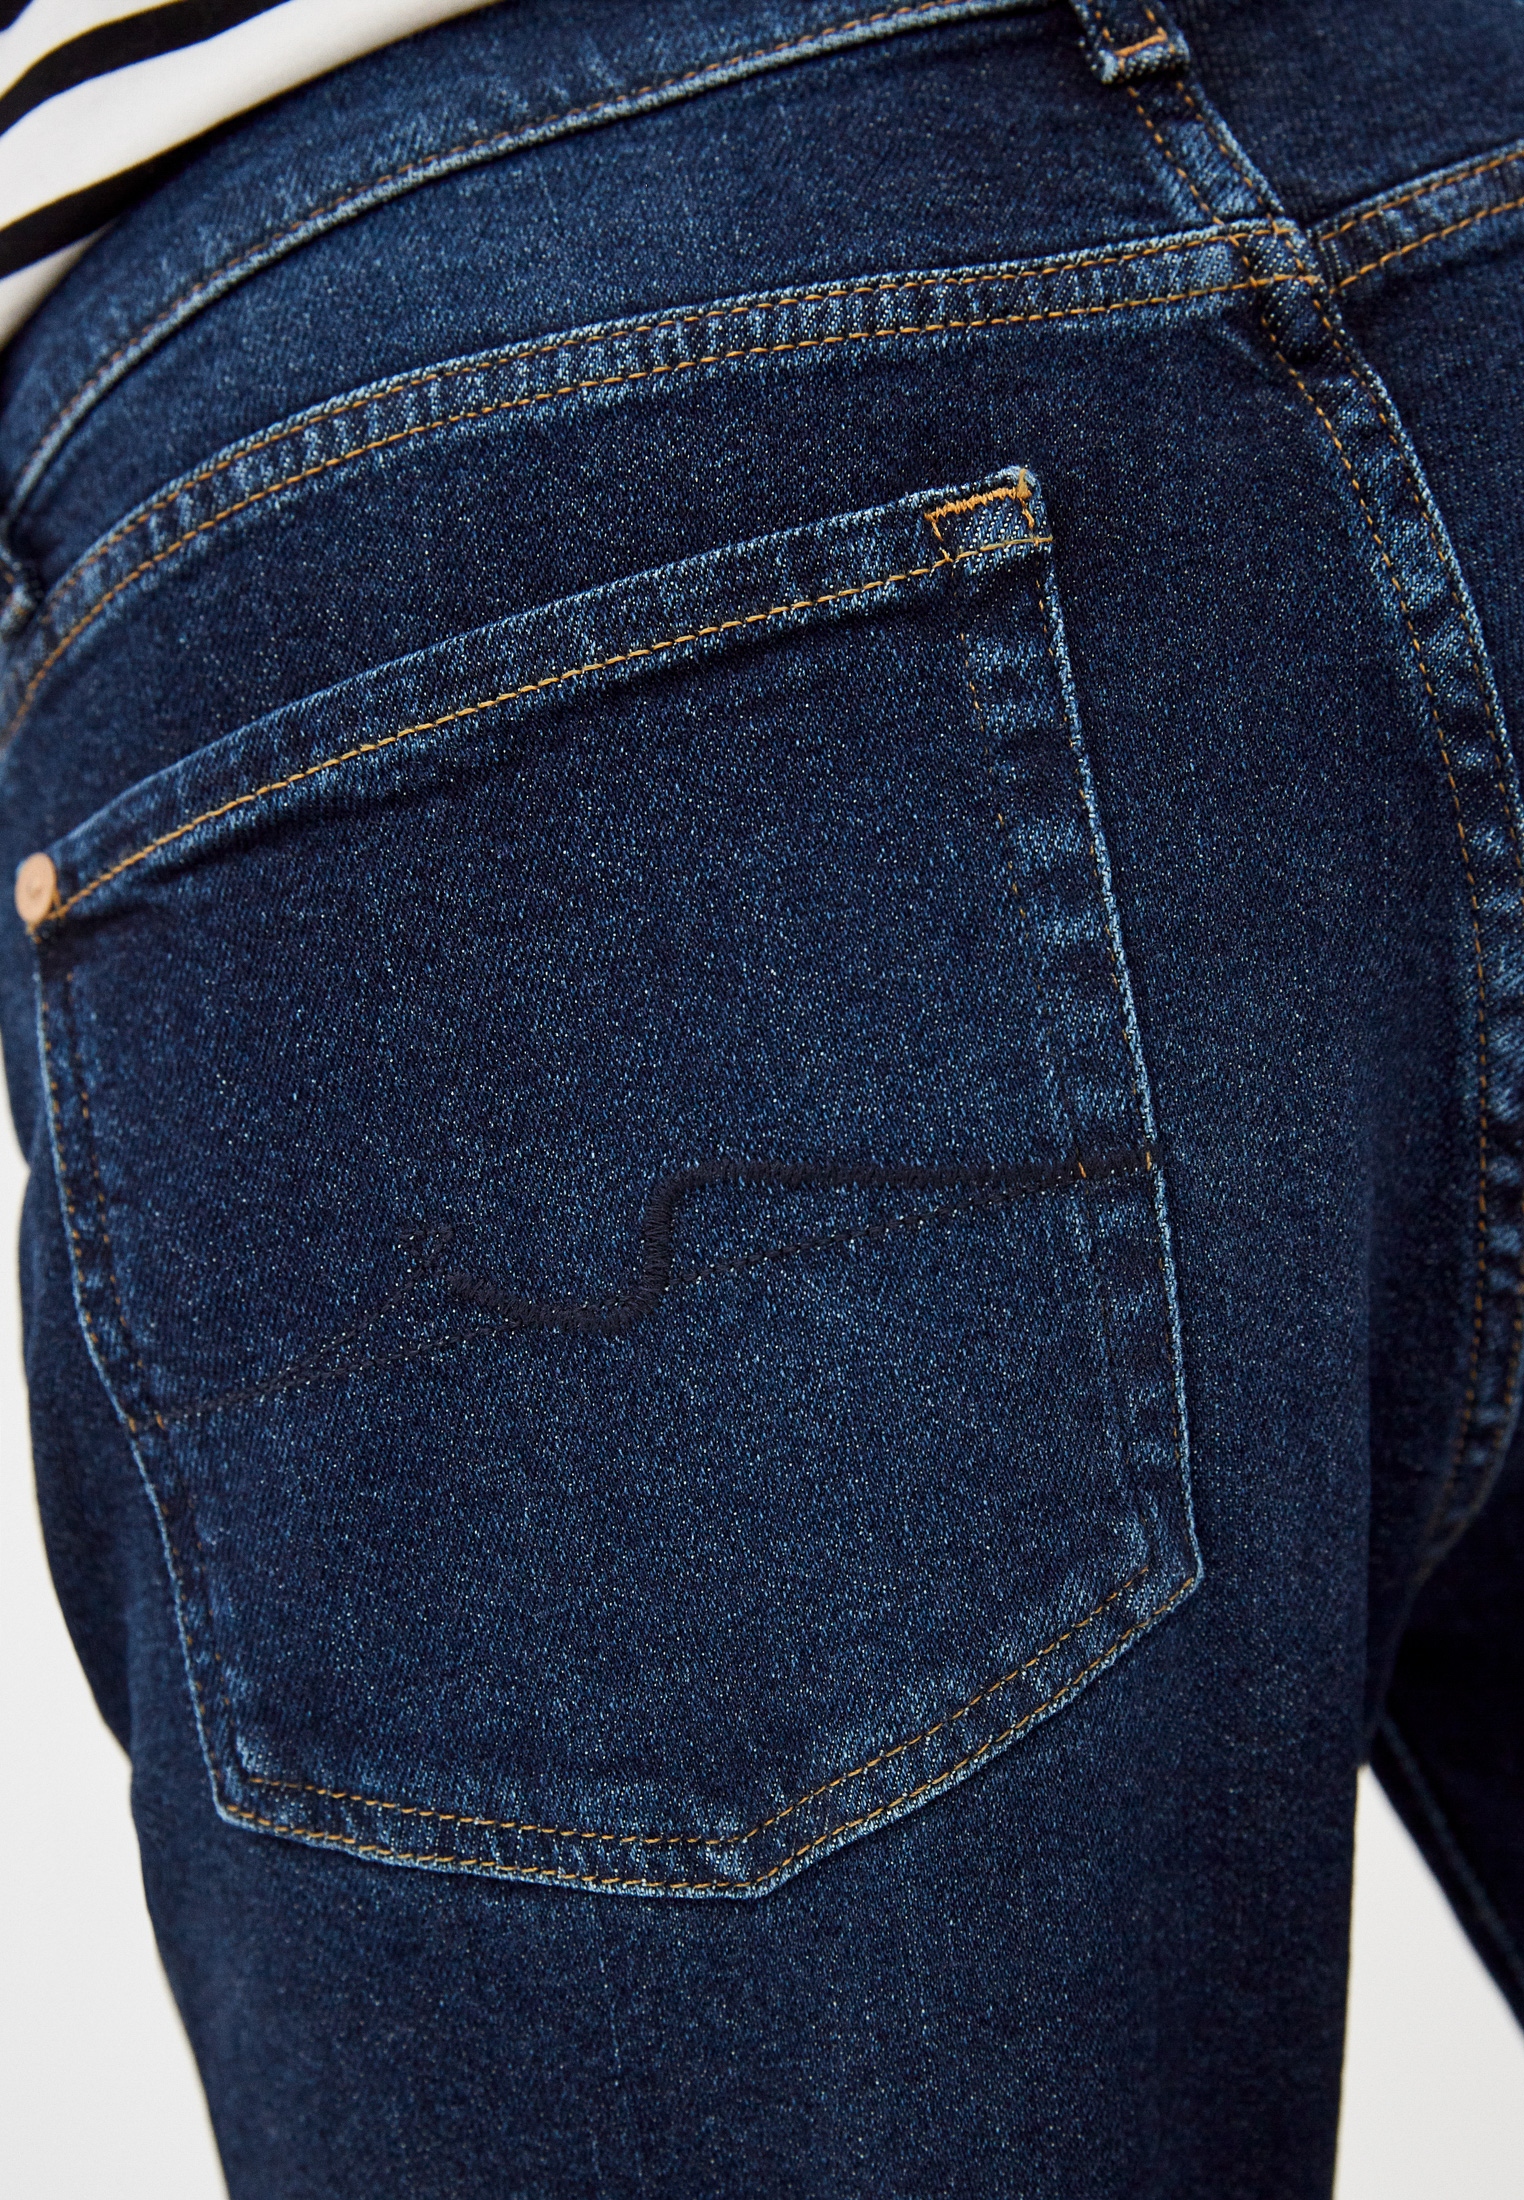 Зауженные джинсы 7 For All Mankind (7 Фо Олл Мэнкайнд) JSDSA910VH: изображение 5